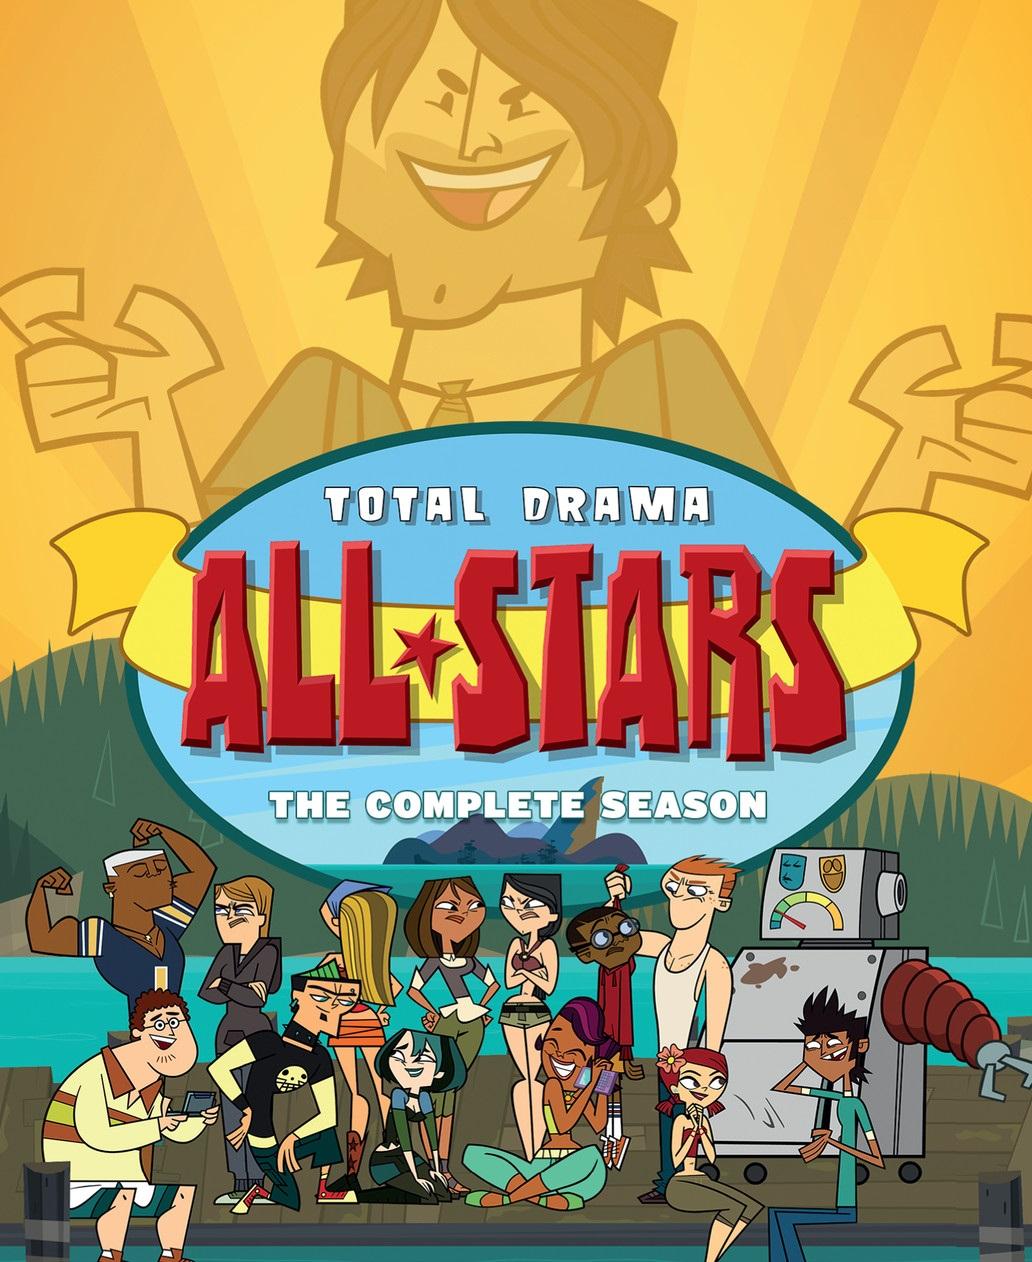 Christian Potenza in Total Drama All Stars (2013)